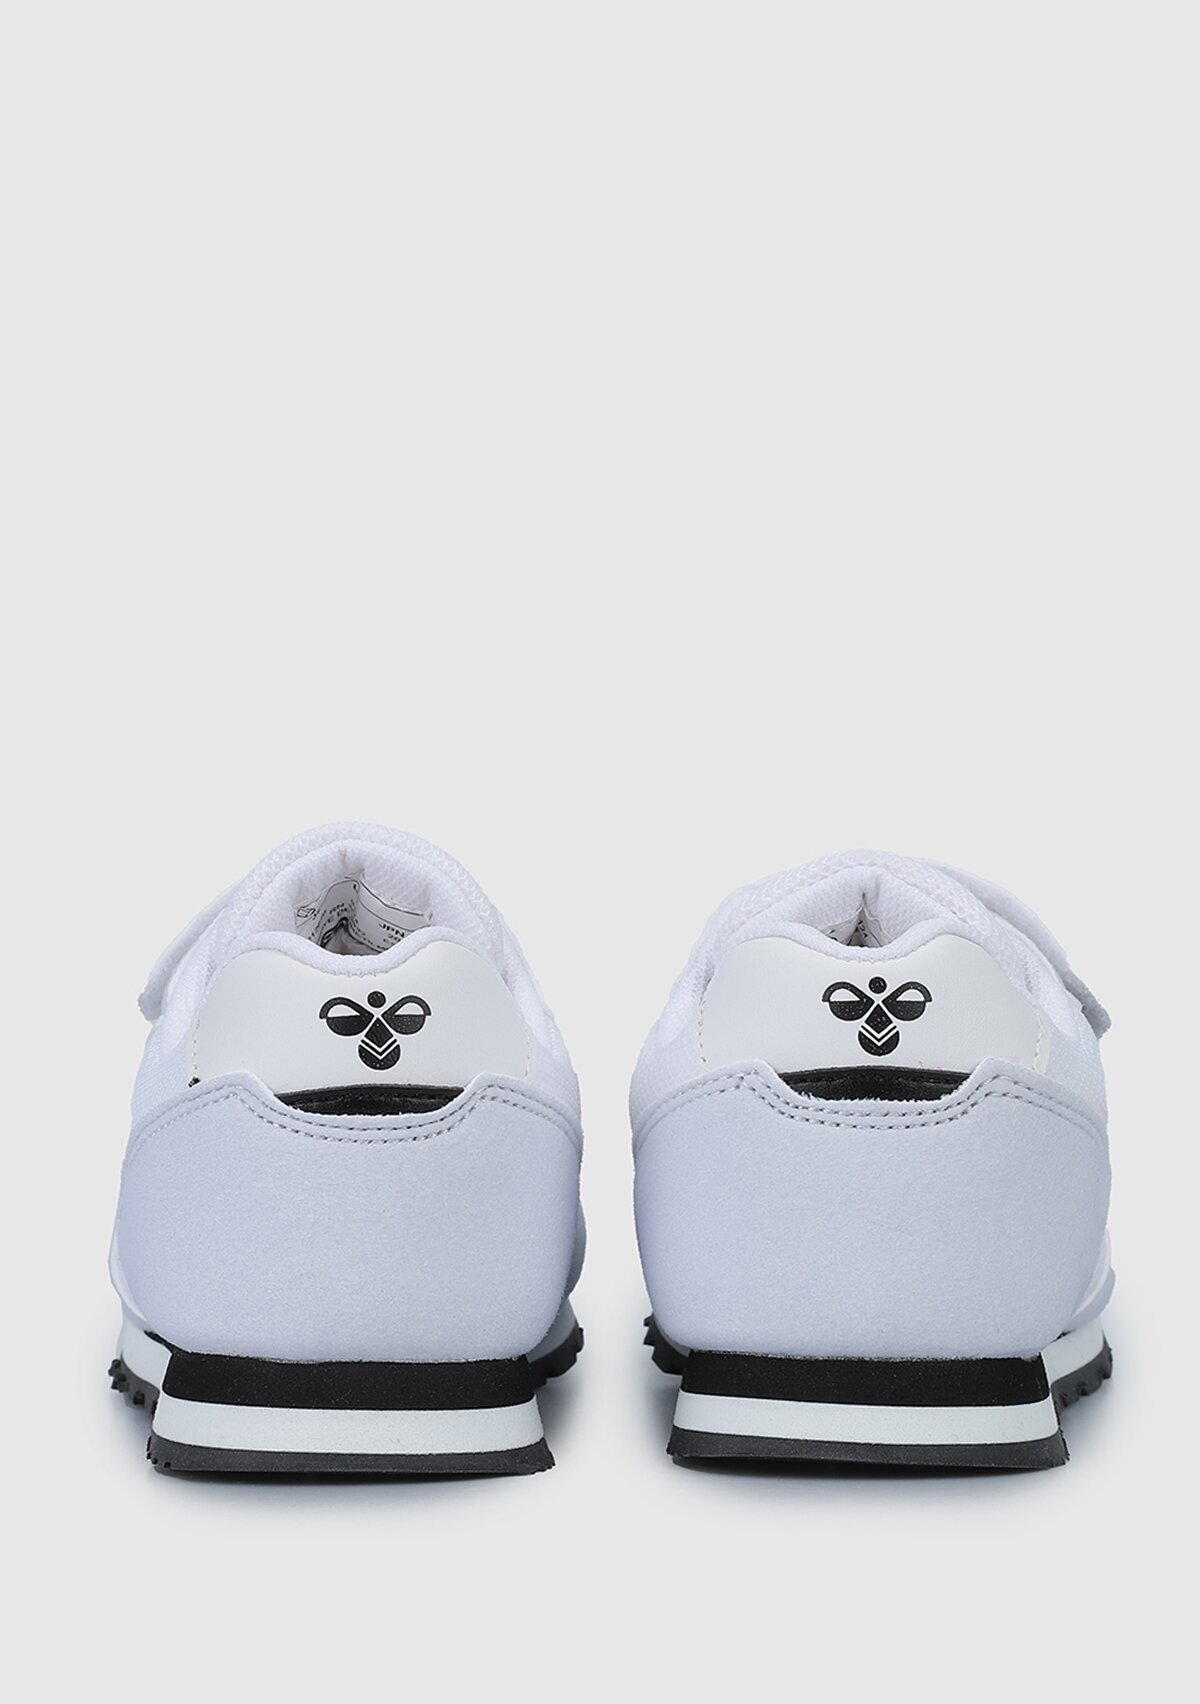 resm Hmlthor Jr Sneaker Beyaz Çocuk Sneaker 212678-9124